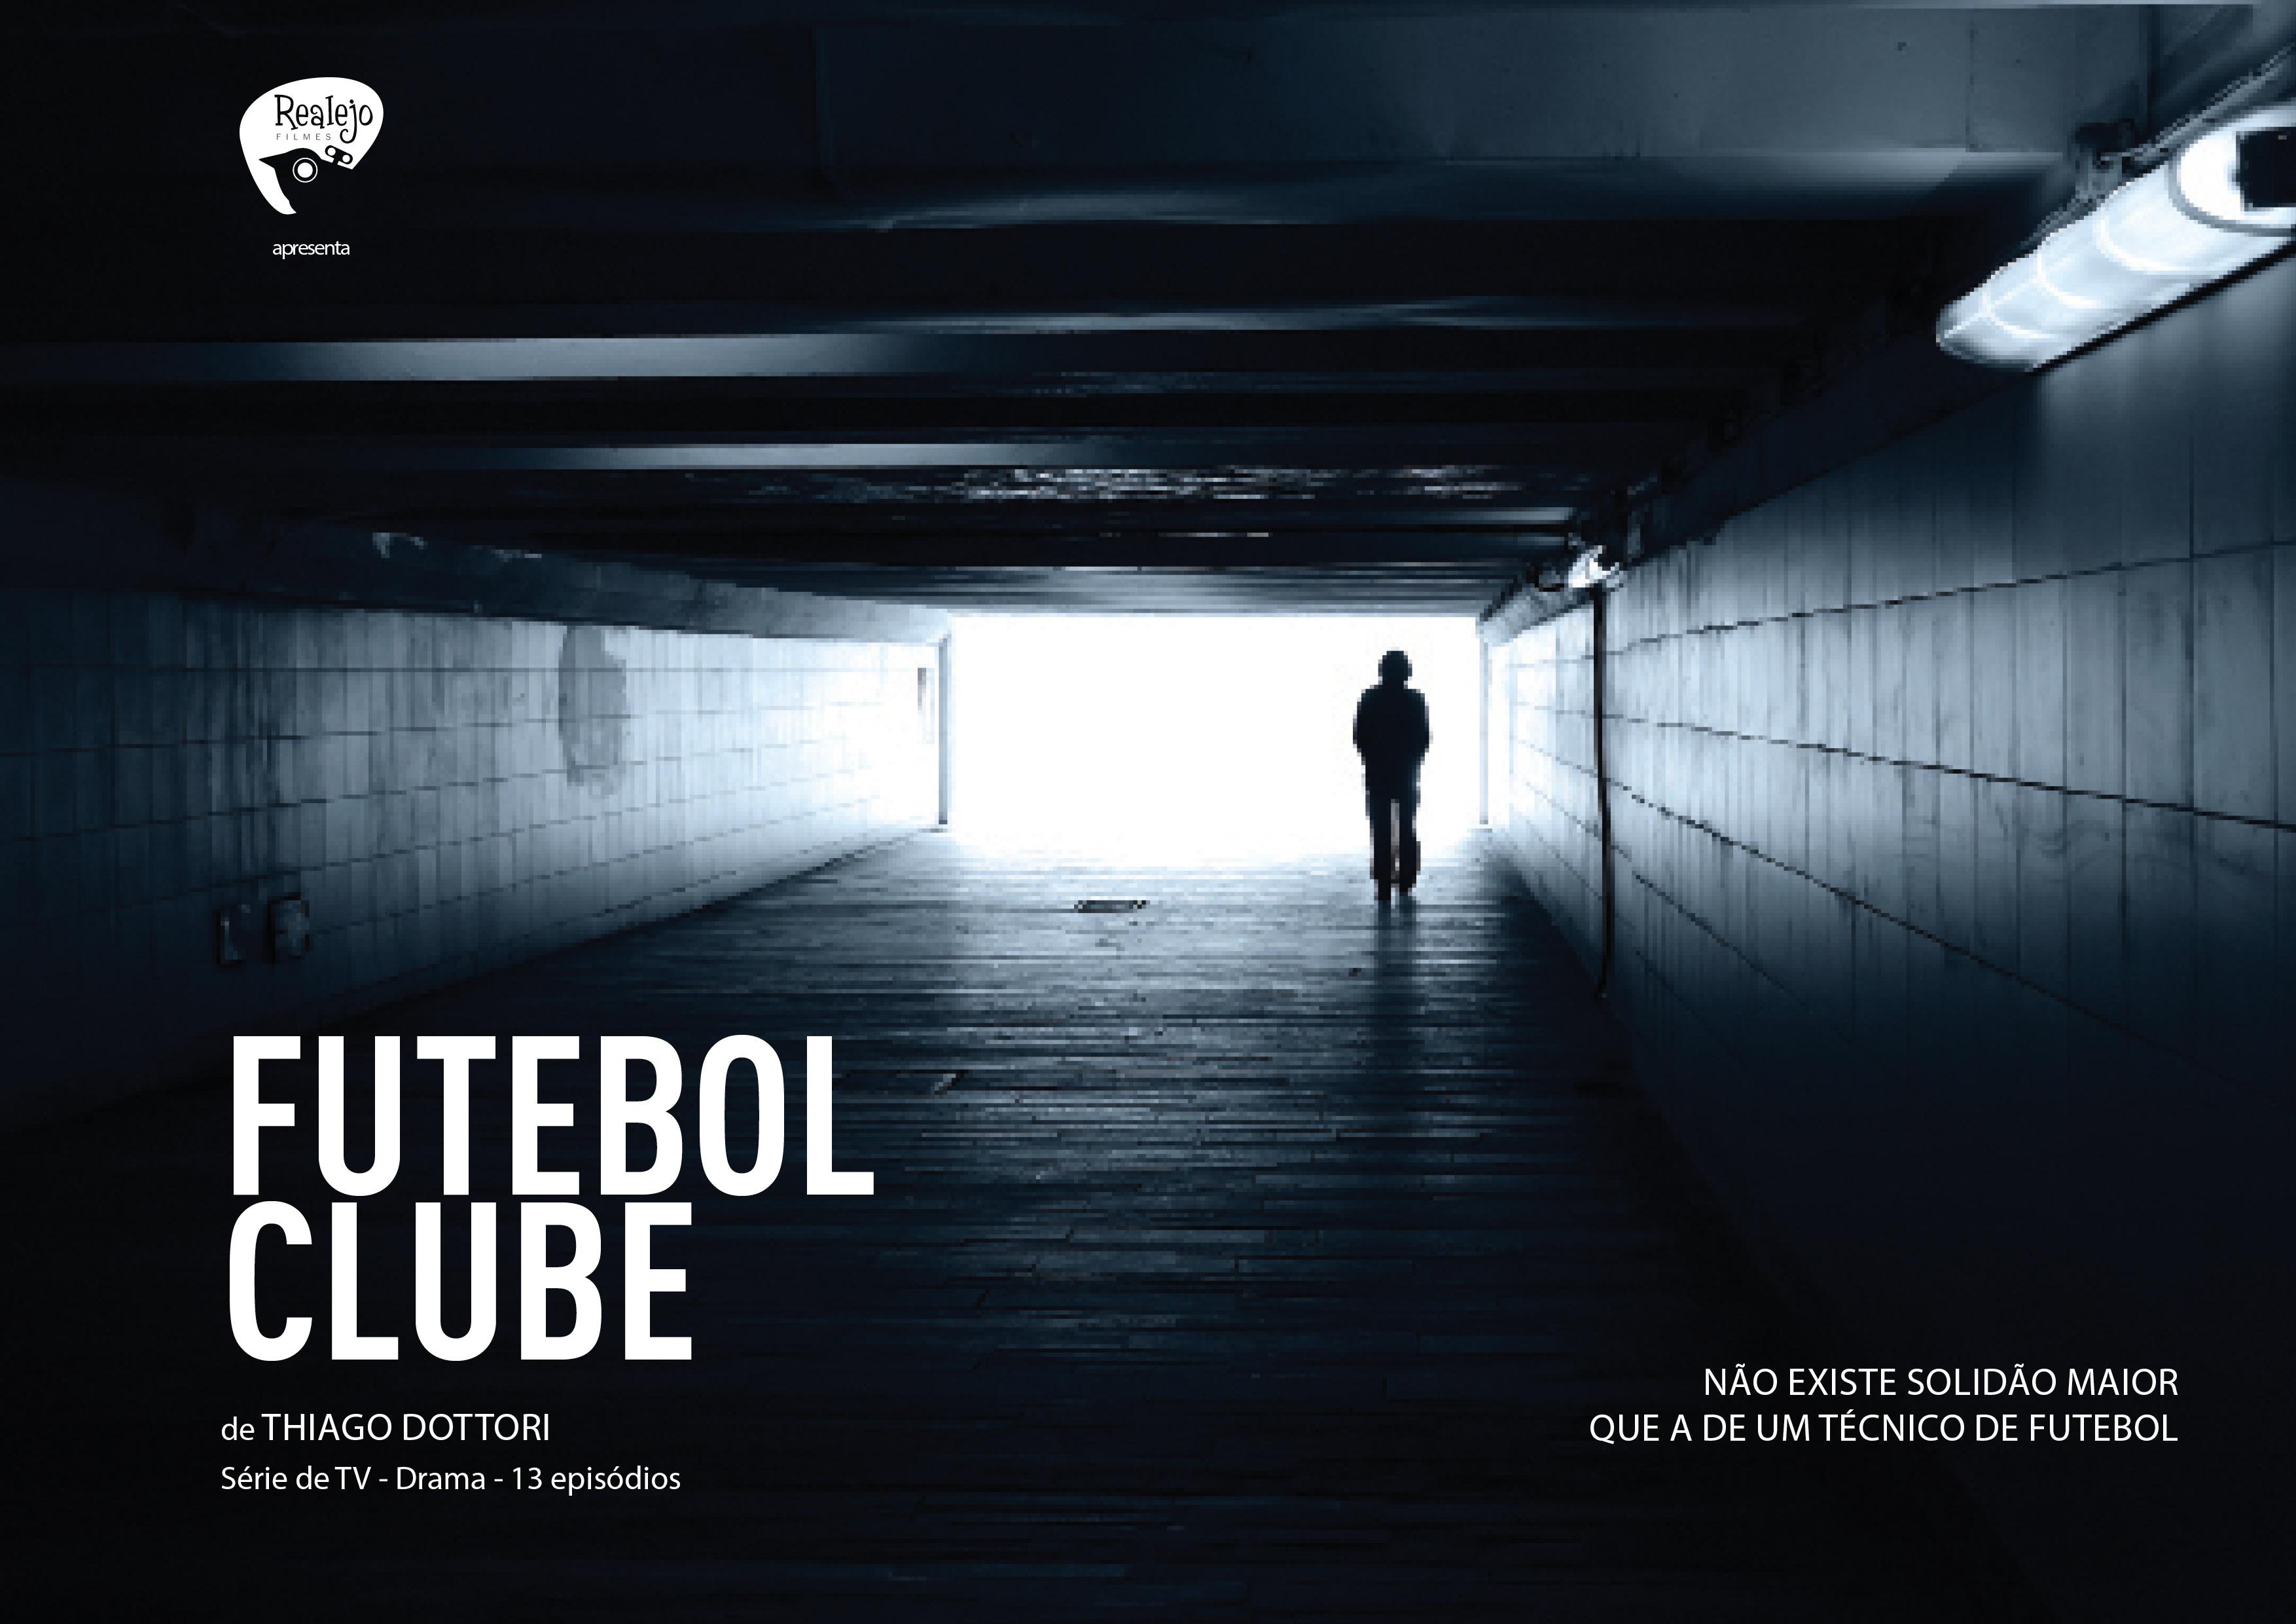 FUTEBOL CLUBE